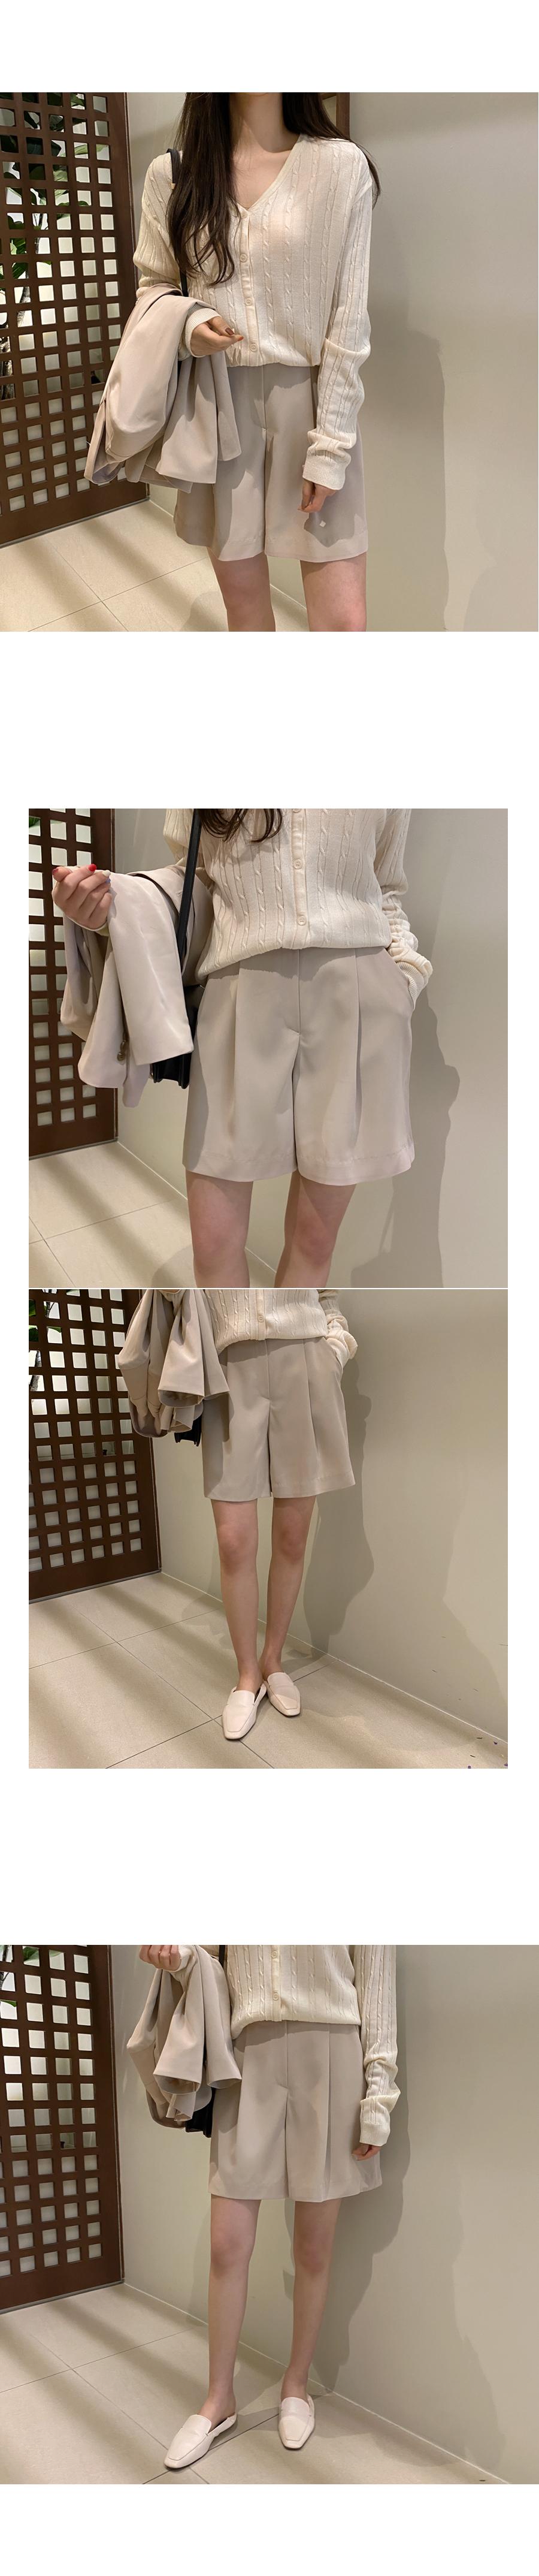 Double jay pants